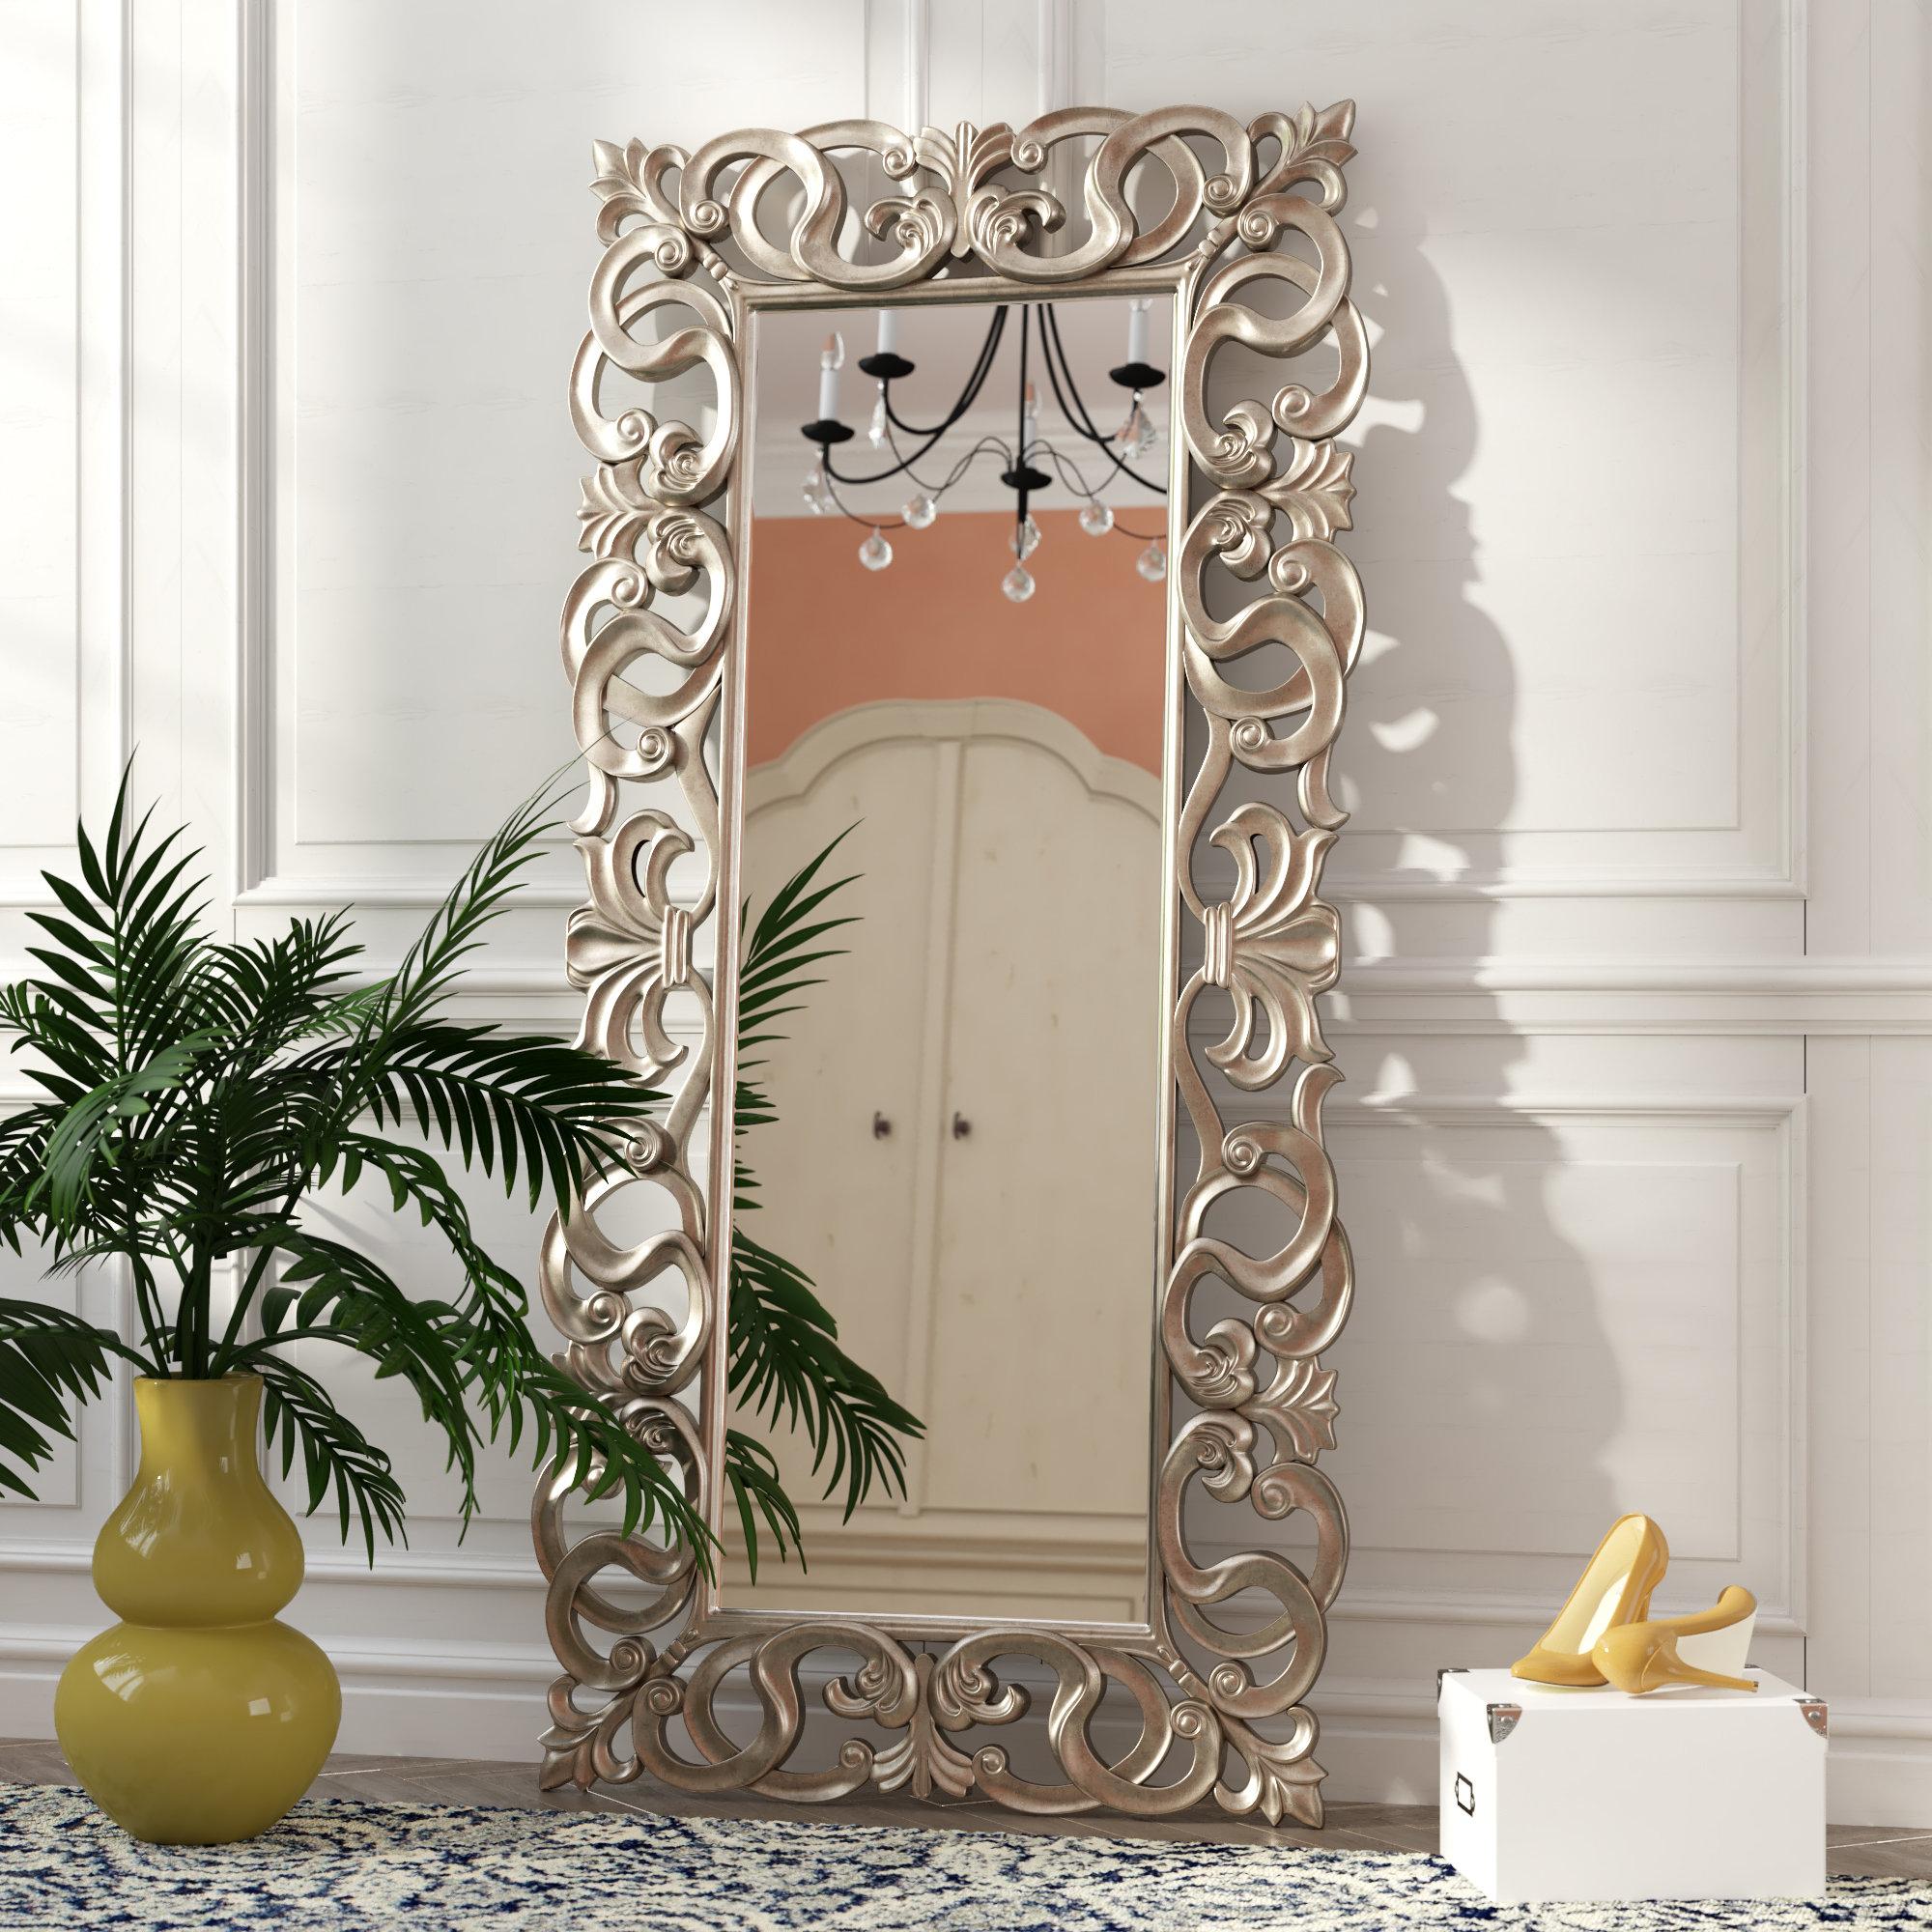 Duke Rectangle Accent Mirror | Wayfair In Lugo Rectangle Accent Mirrors (Image 4 of 20)